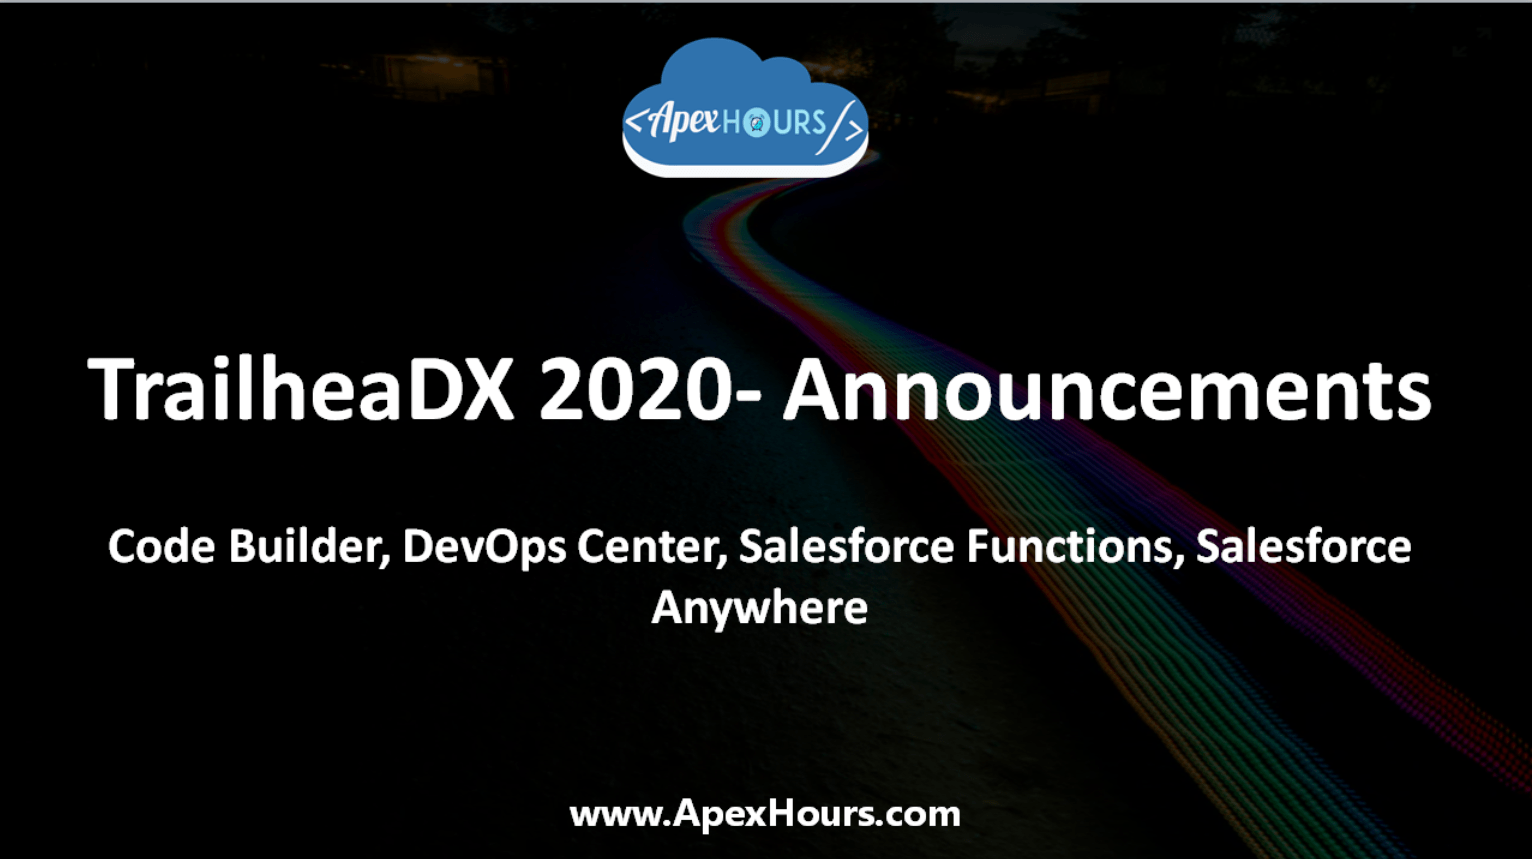 Code Builder, DevOps Center, Salesforce Functions, Salesforce Anywhere